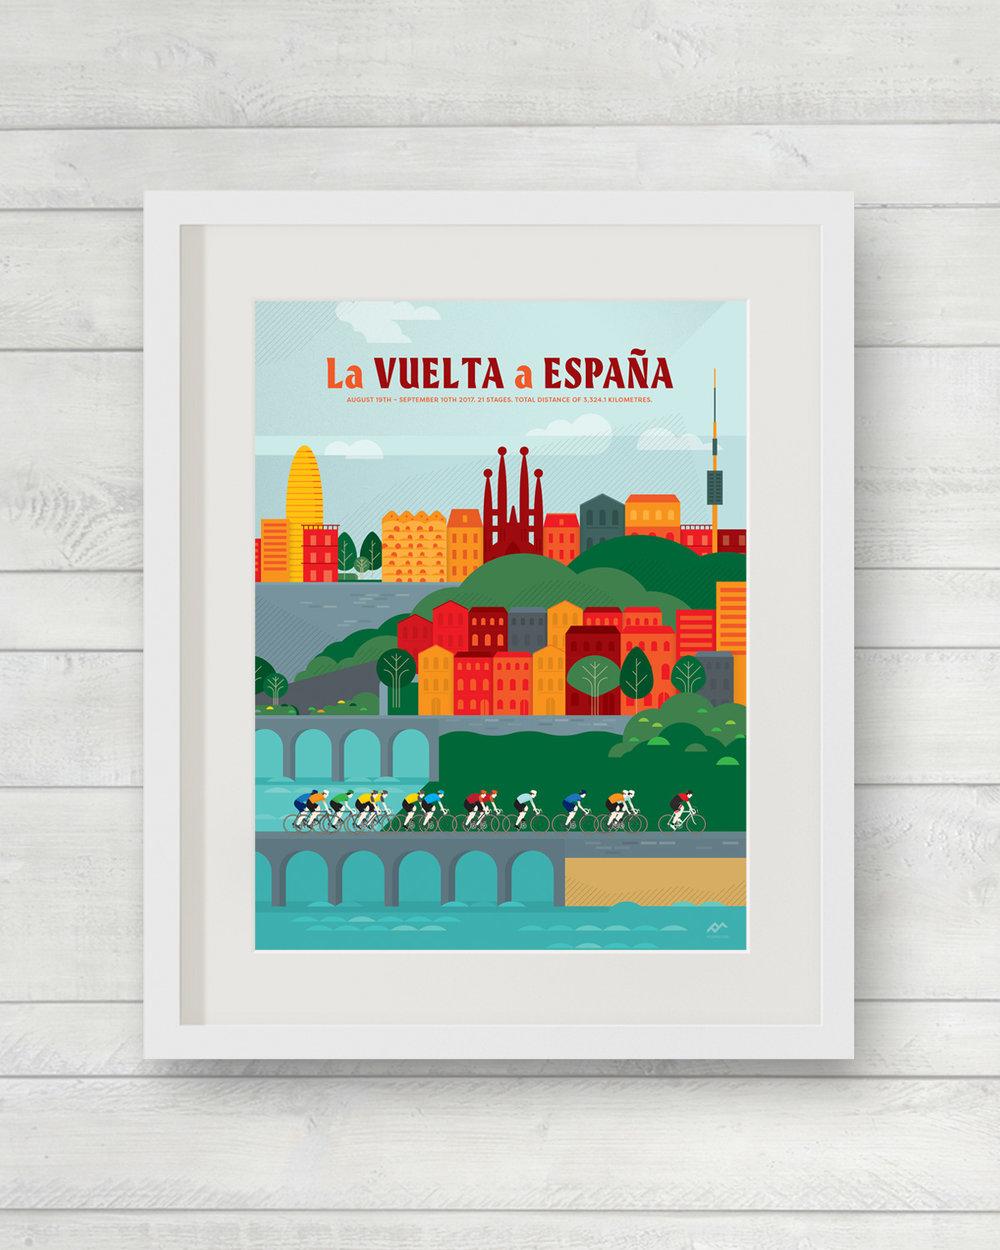 Vuelta 2017 | ©veloposters